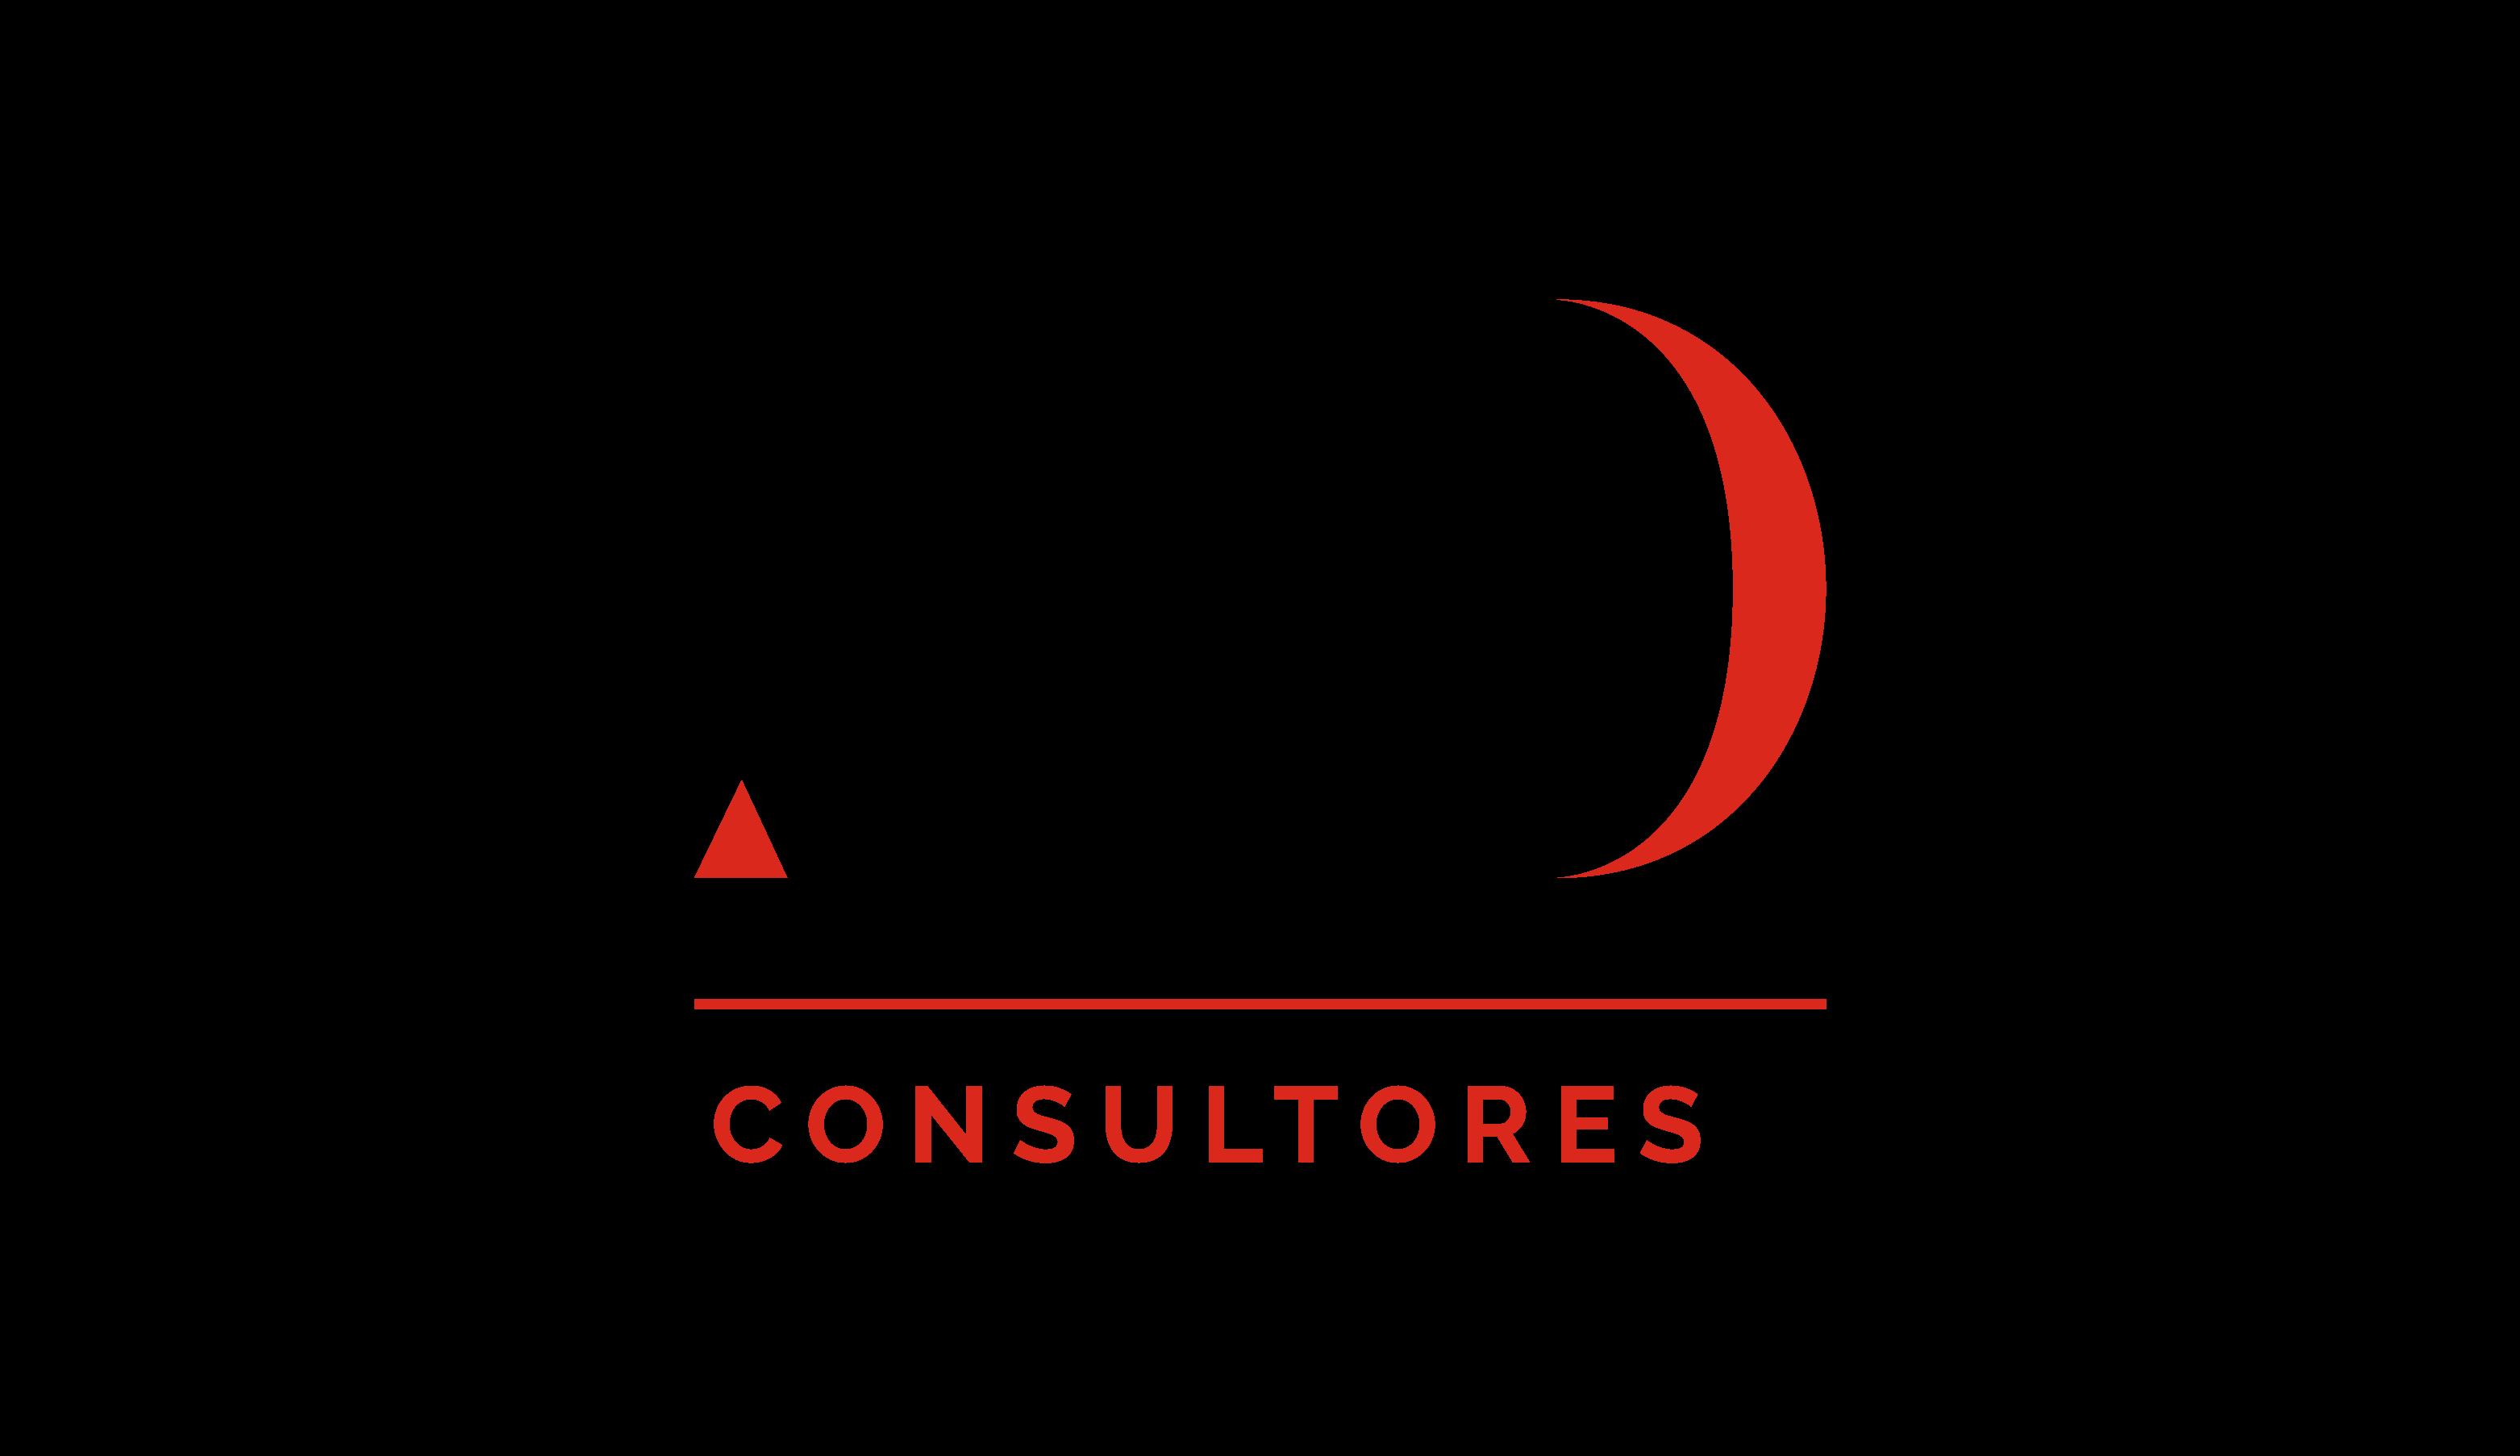 base_logo_transparent_background